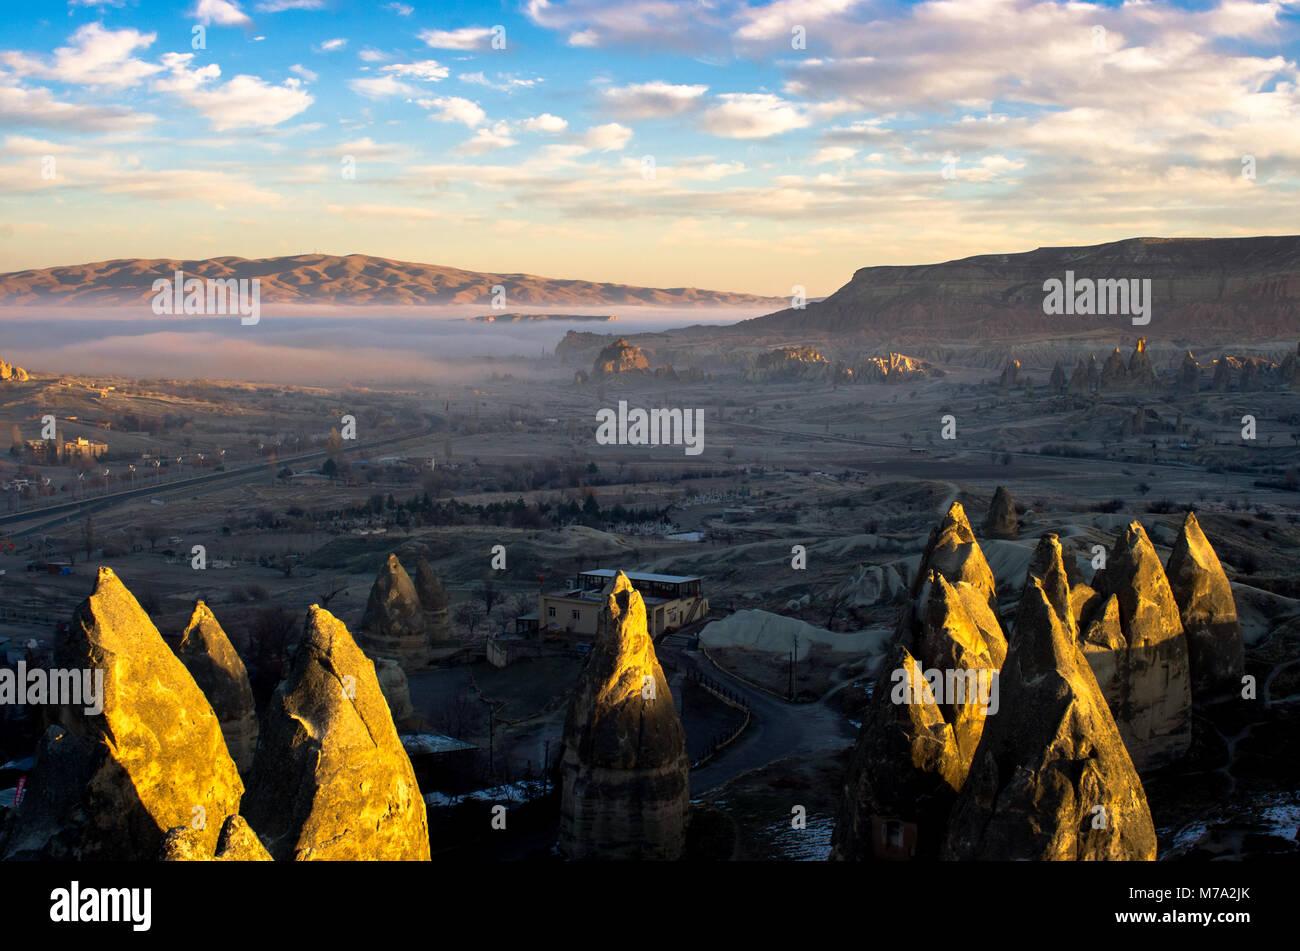 Mist over the mystical landscape of Cappadocia, Turkey - Stock Image